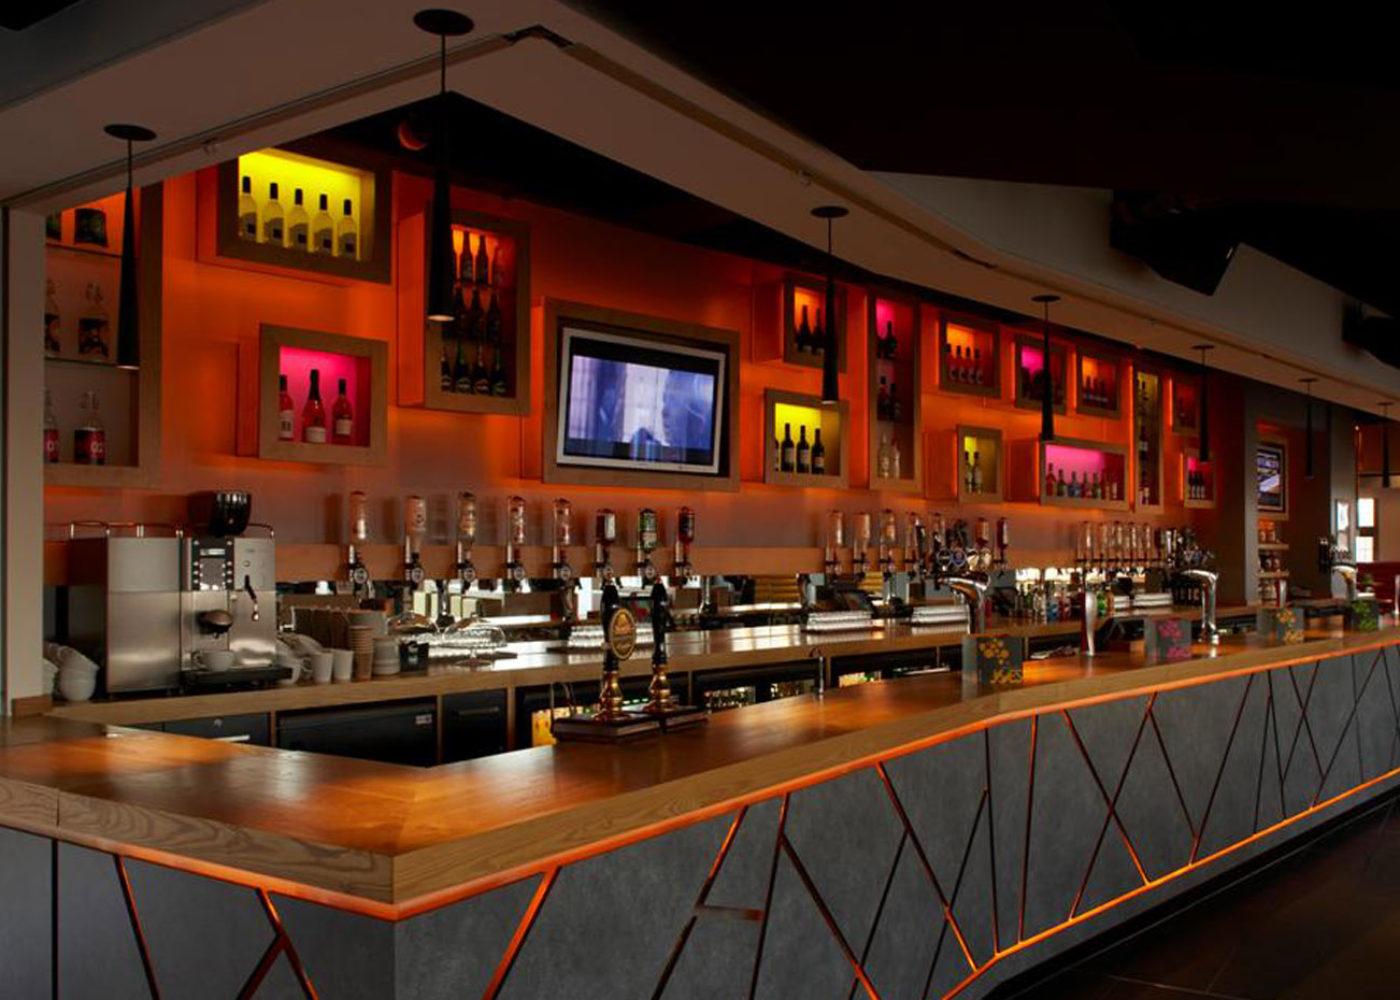 Joes-Bar-Birmingham-University1